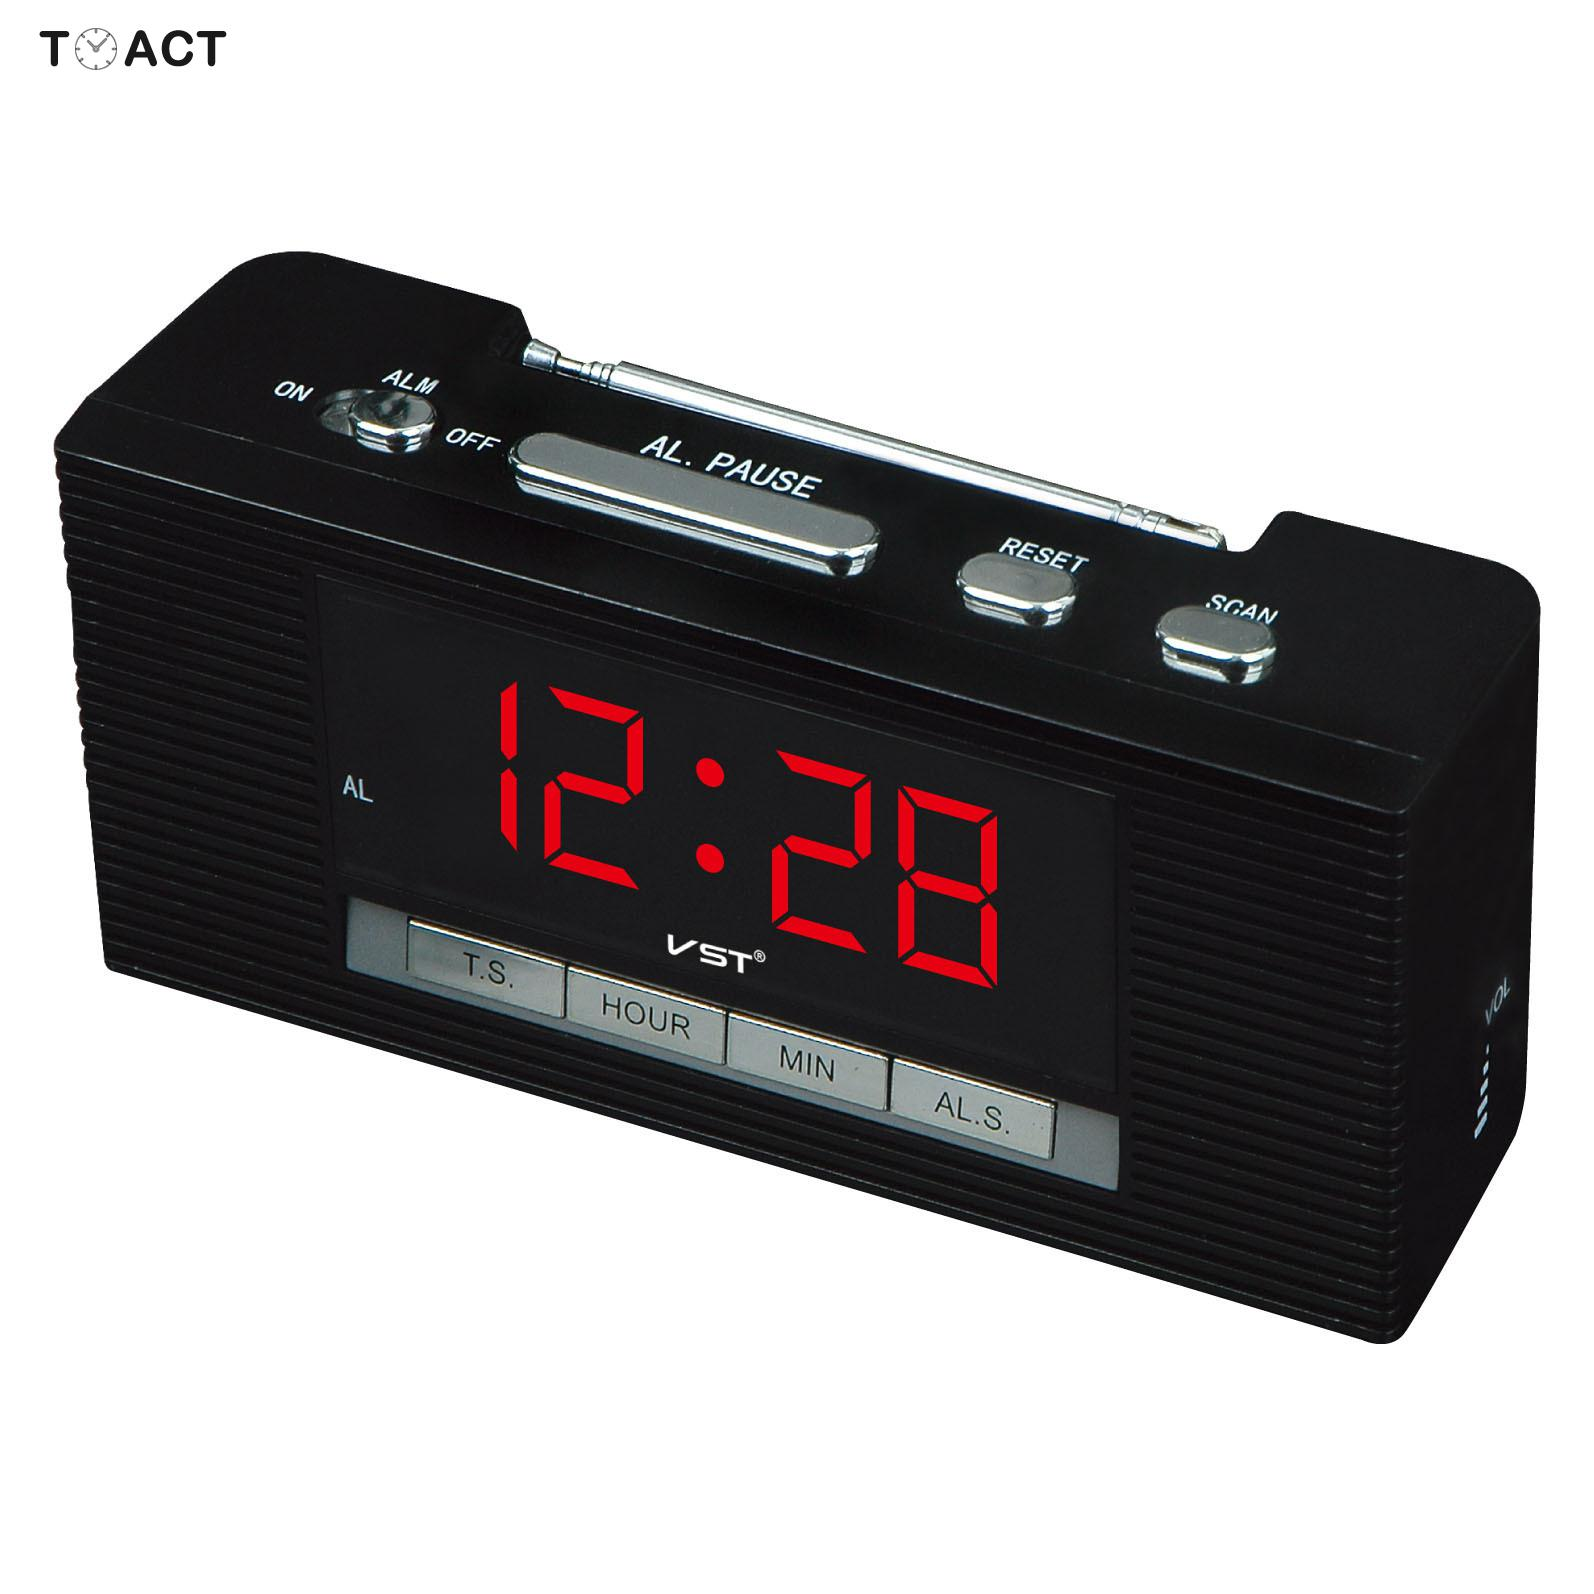 US $18.95 15% OFF|LED Clock FM Radio Alarm Clock Night Watch Electronic Table Digital Watches Luminova Bedroom Home Decor Best For Gift|Alarm Clocks|